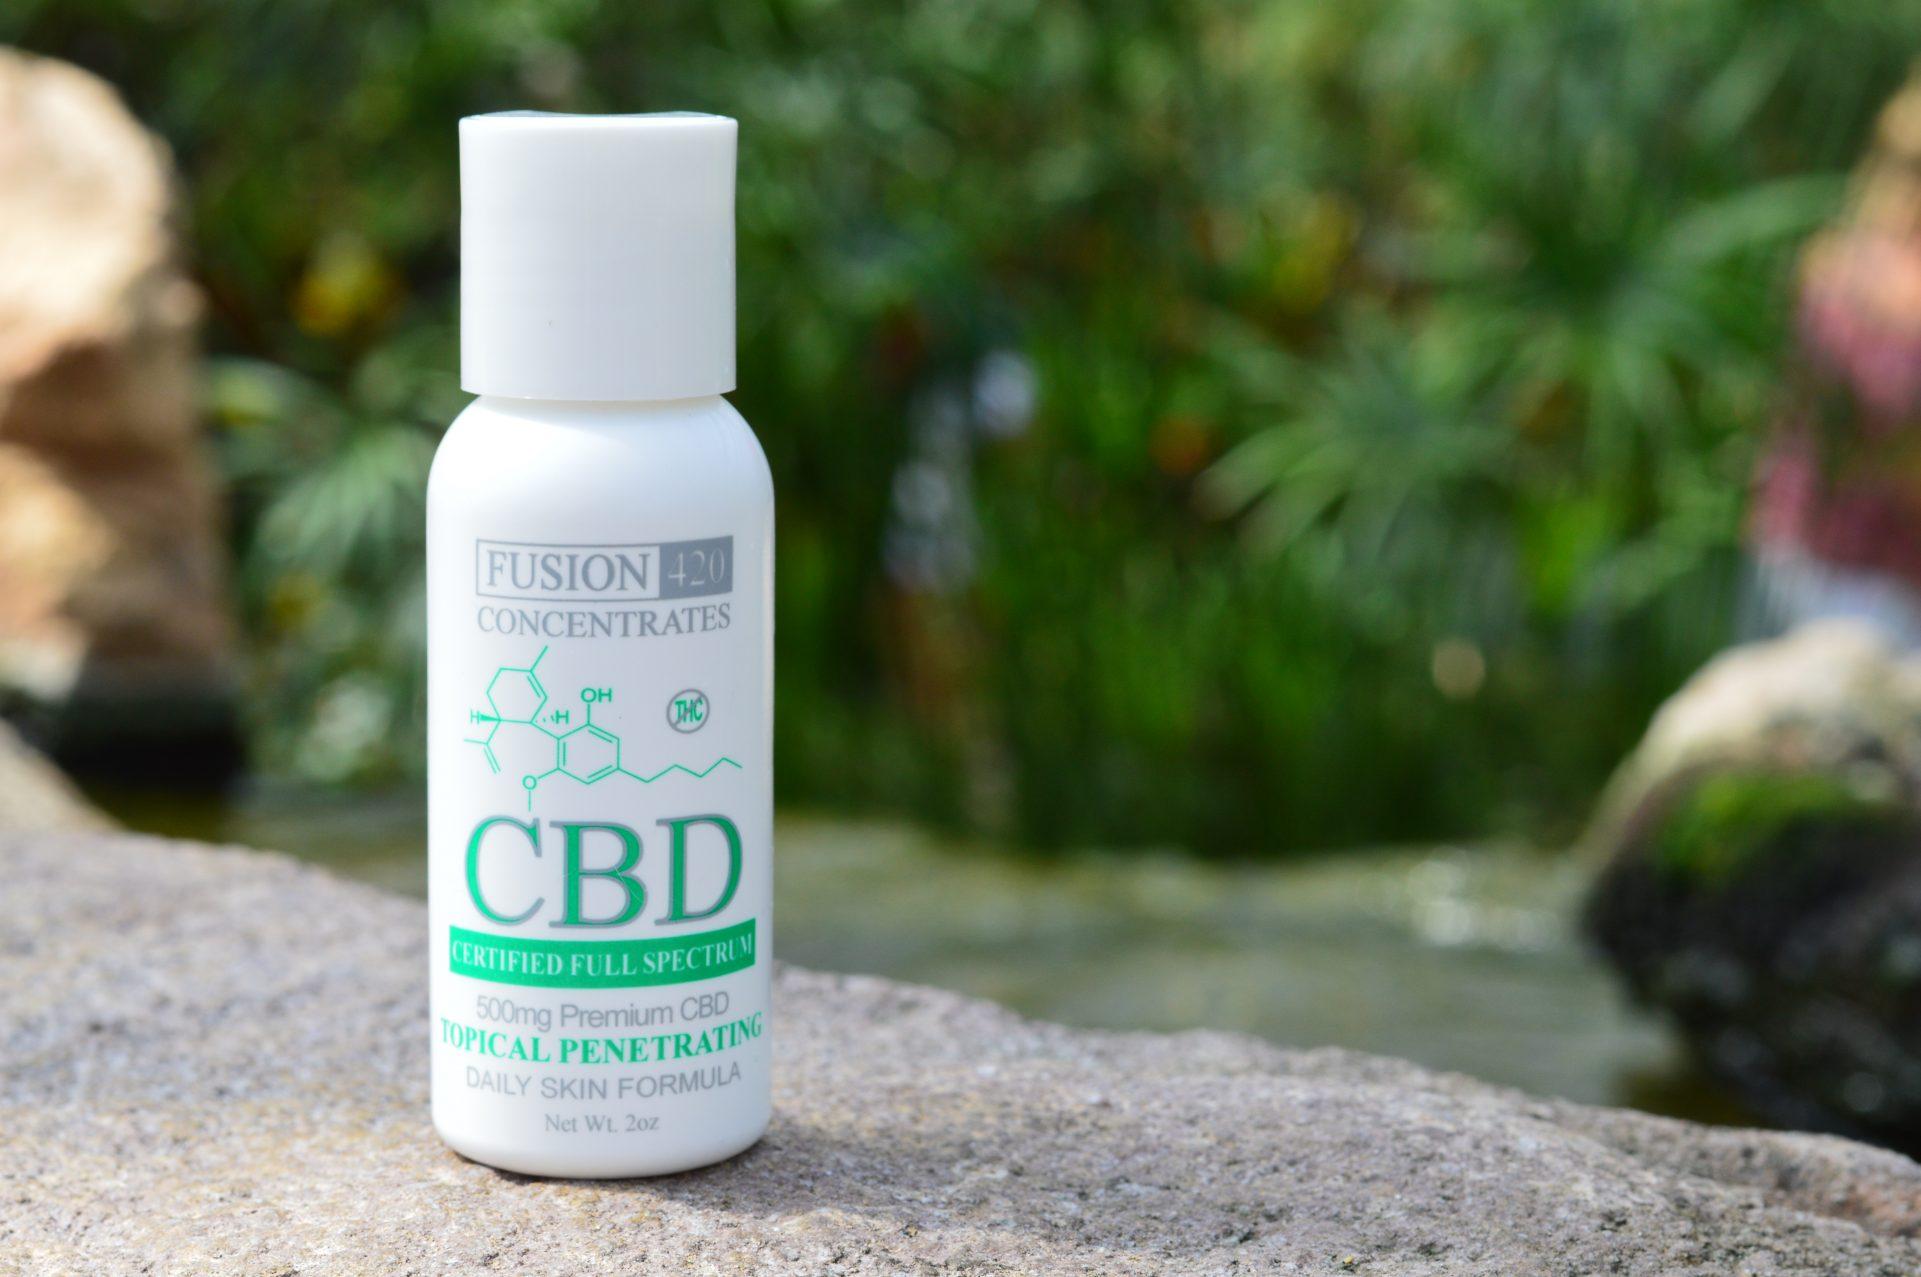 CBD Daily Skincare Muscle Pain Creme Formula